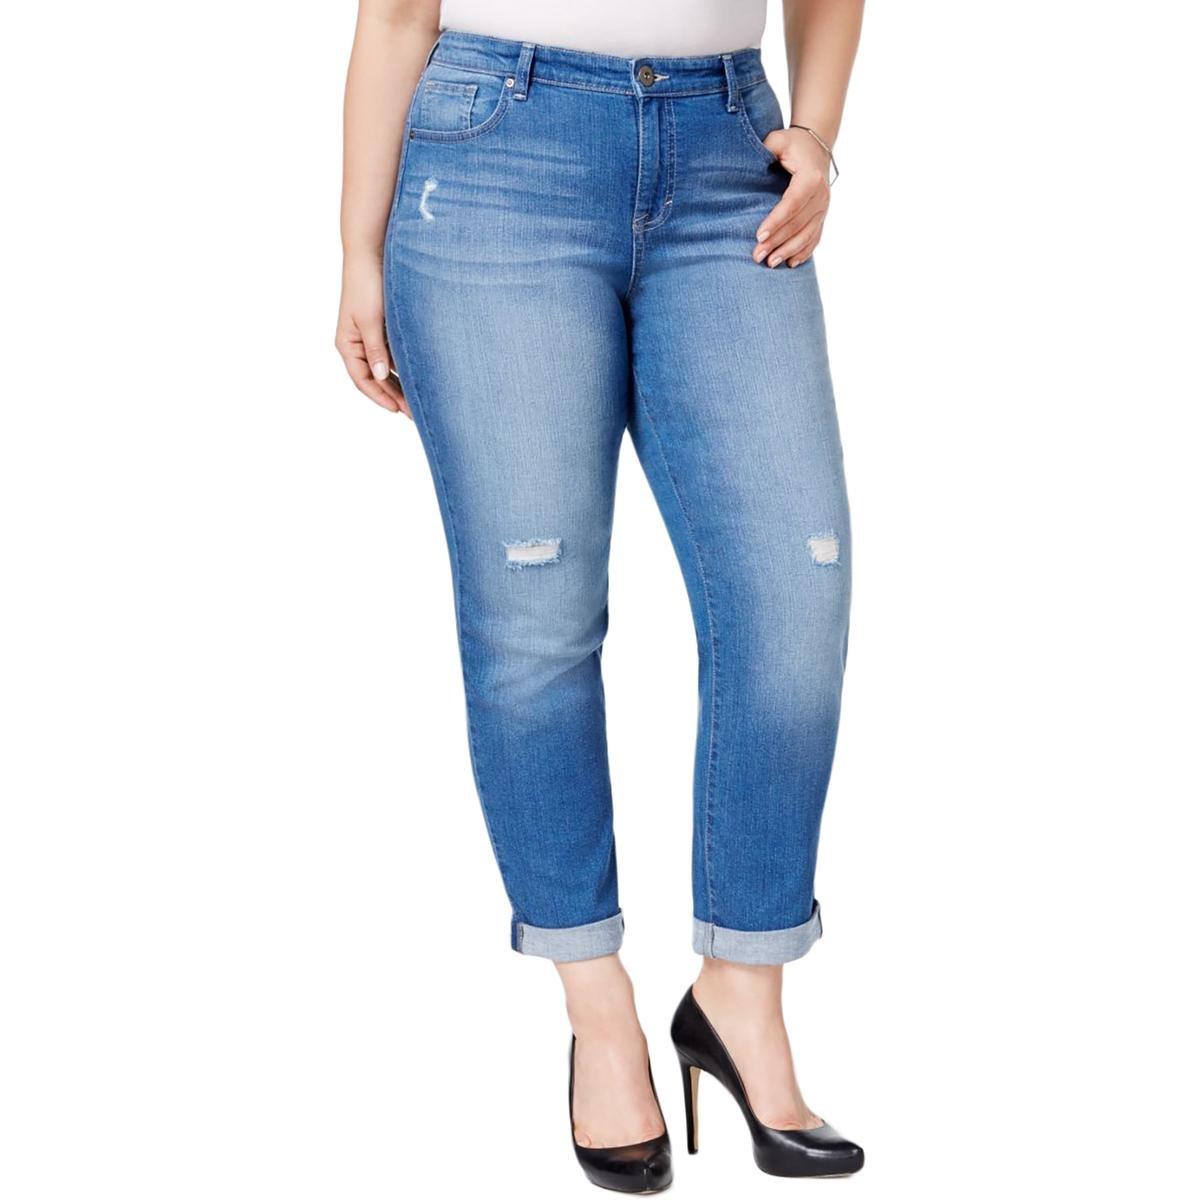 Style & Co. Womens Plus Distressed Ankle Boyfriend Jeans Blue 24W